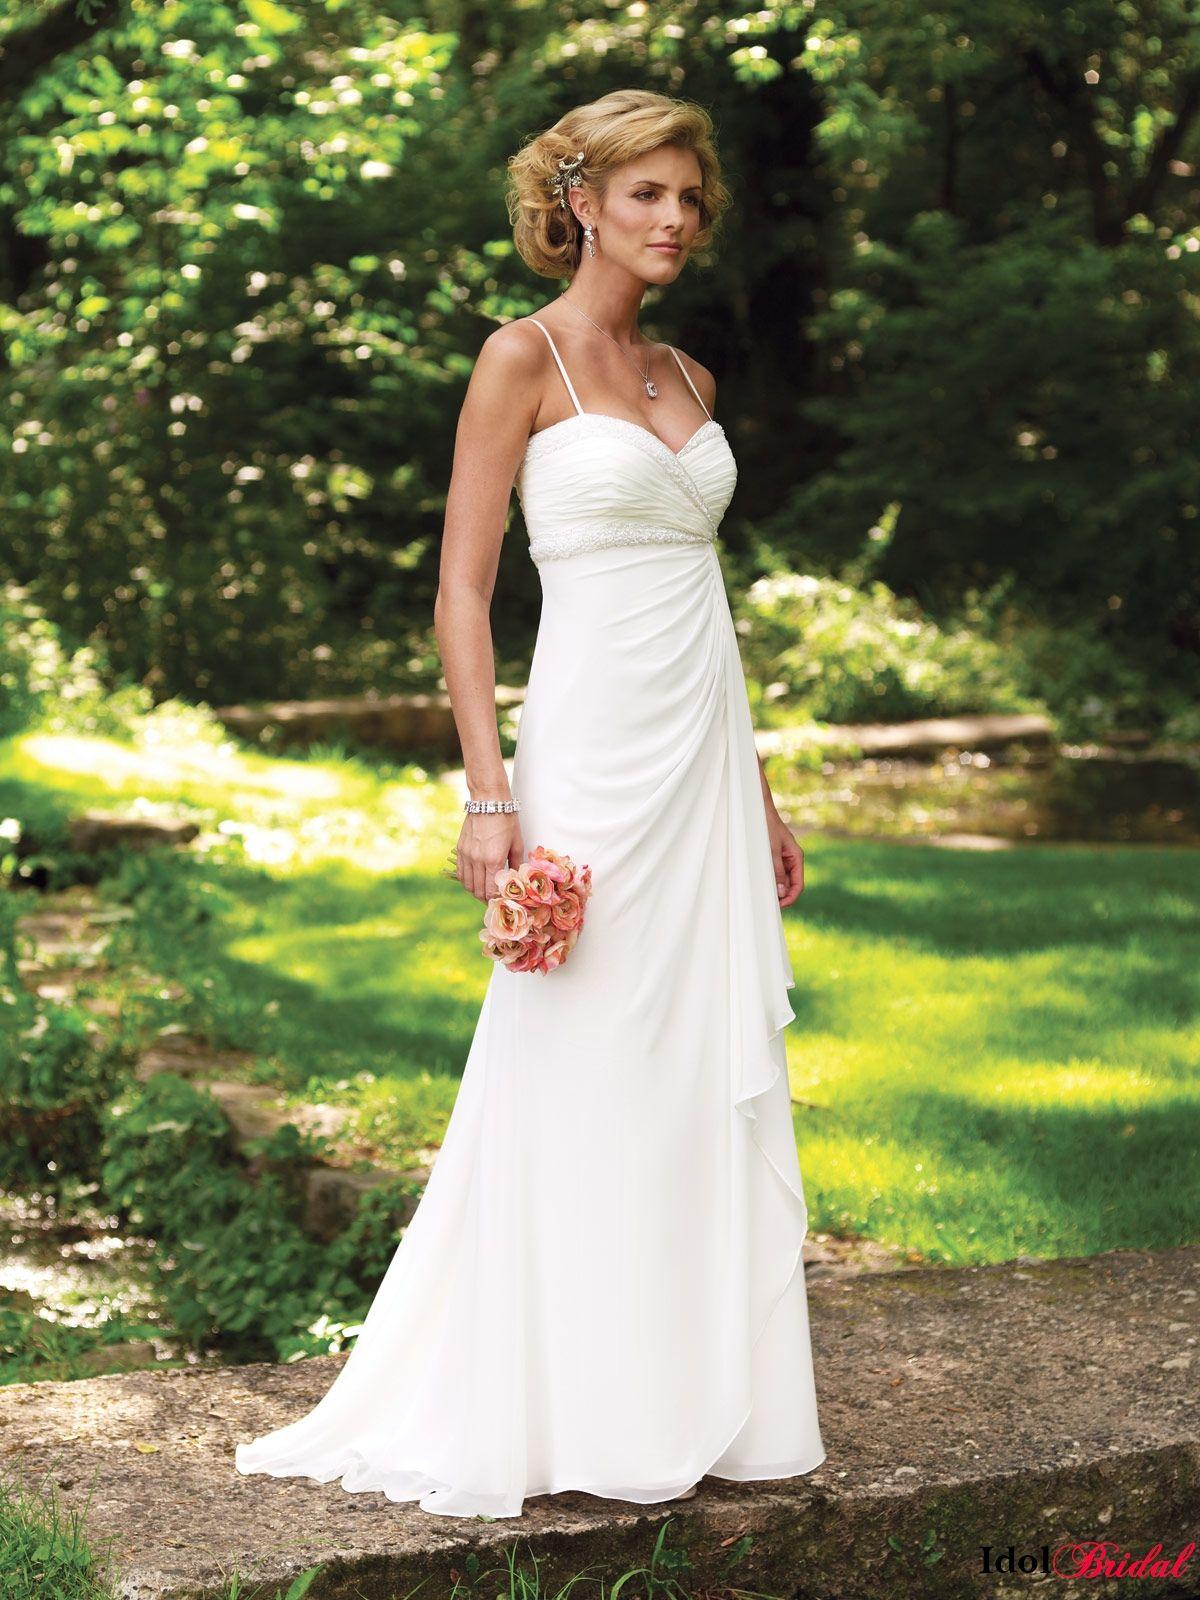 Simple Wedding Dresses Idas028 199 99 Usd Yet Still Beautiful Enough For My Standards